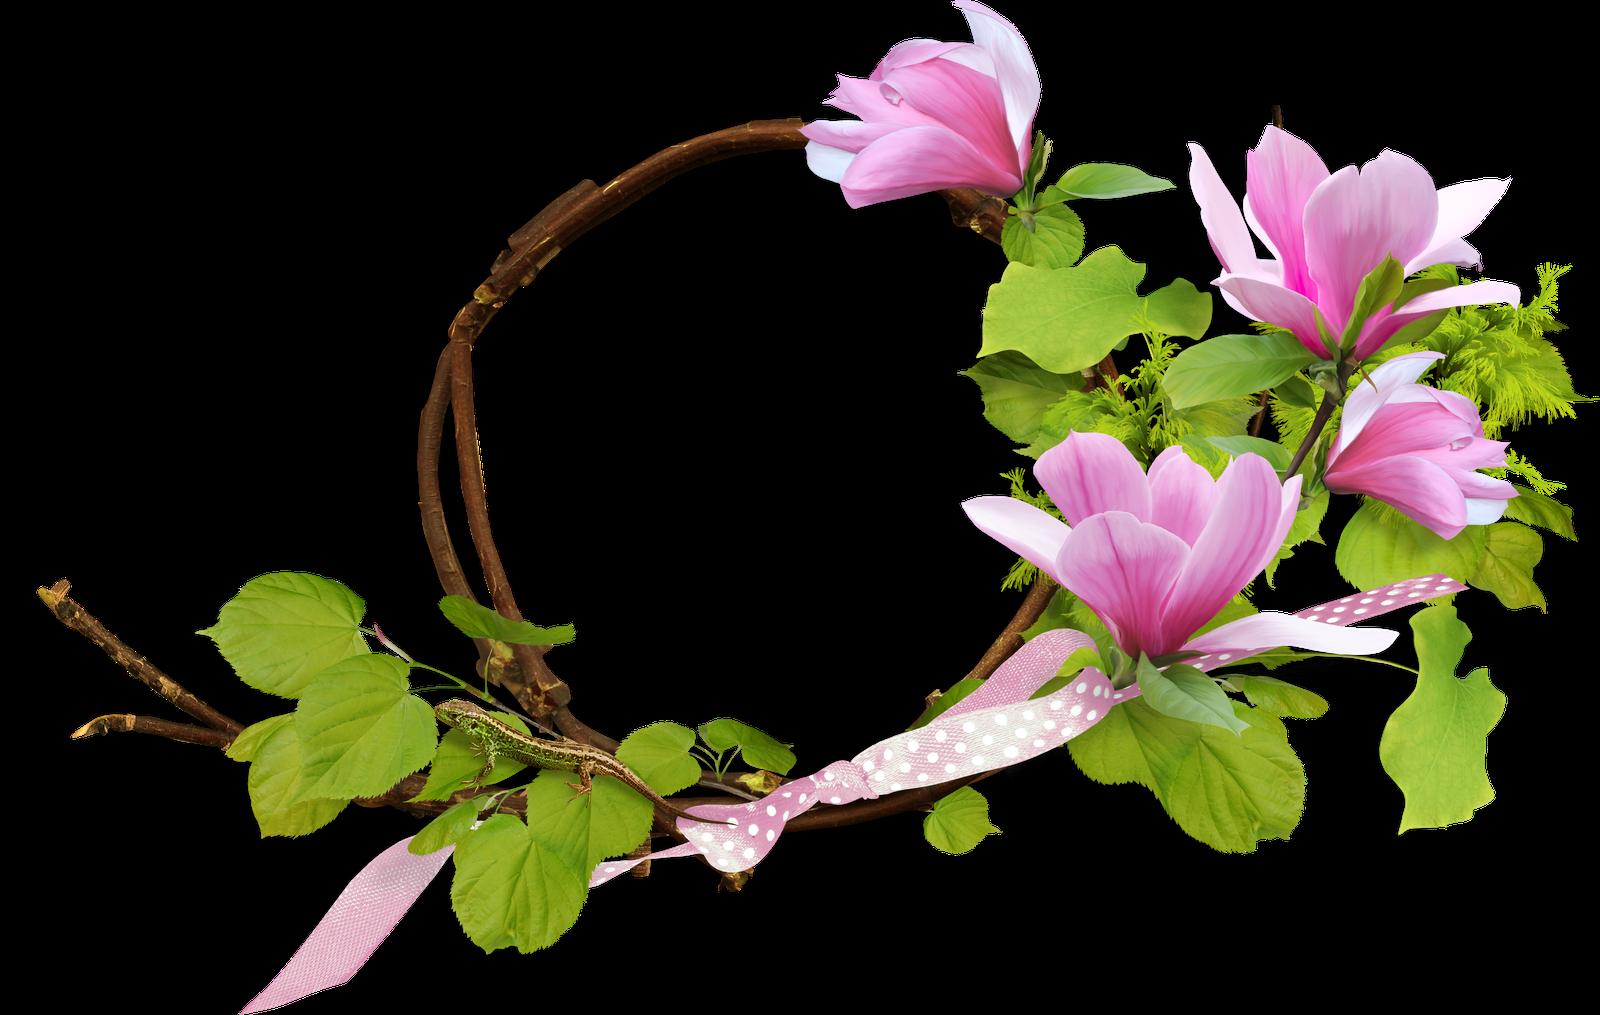 marcos gratis para fotos marcos florales png marcos de flores